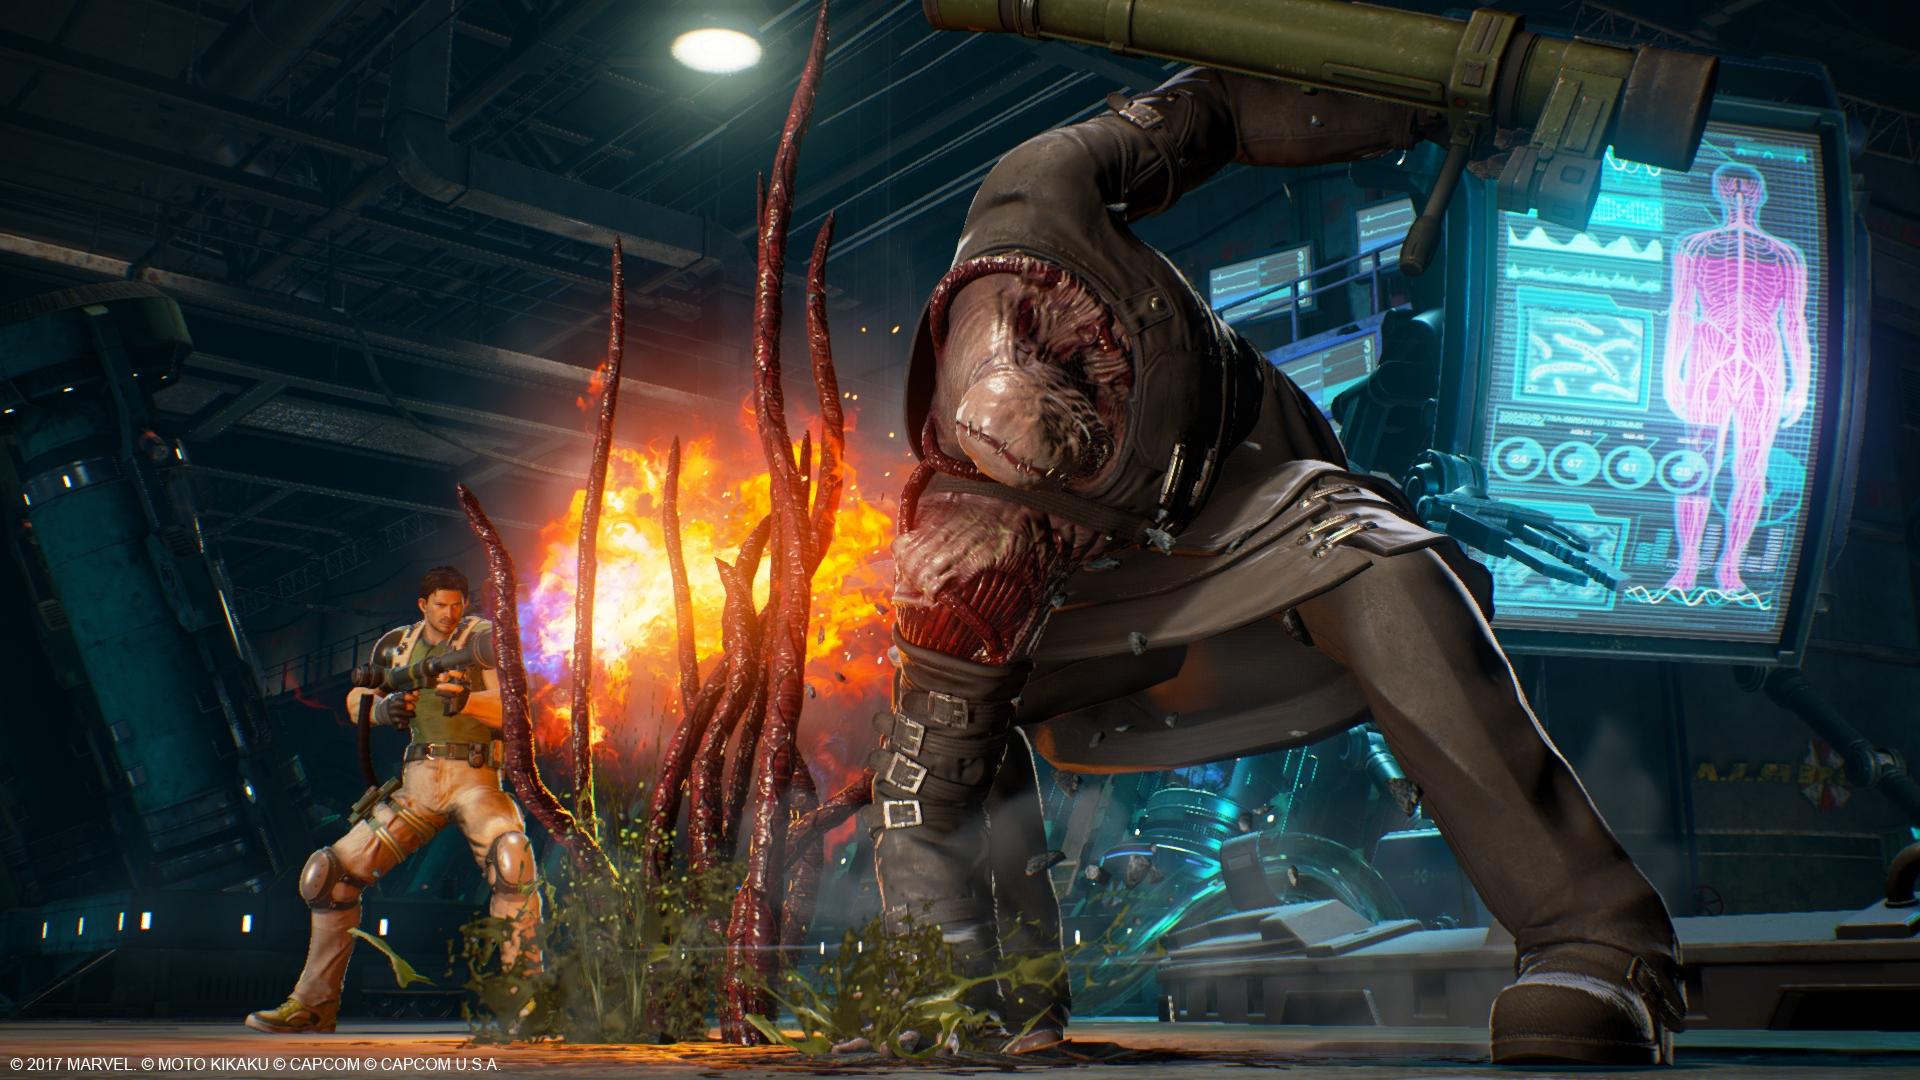 Marvel vs. Capcom: Infinite - Nemesis vs. Chriss